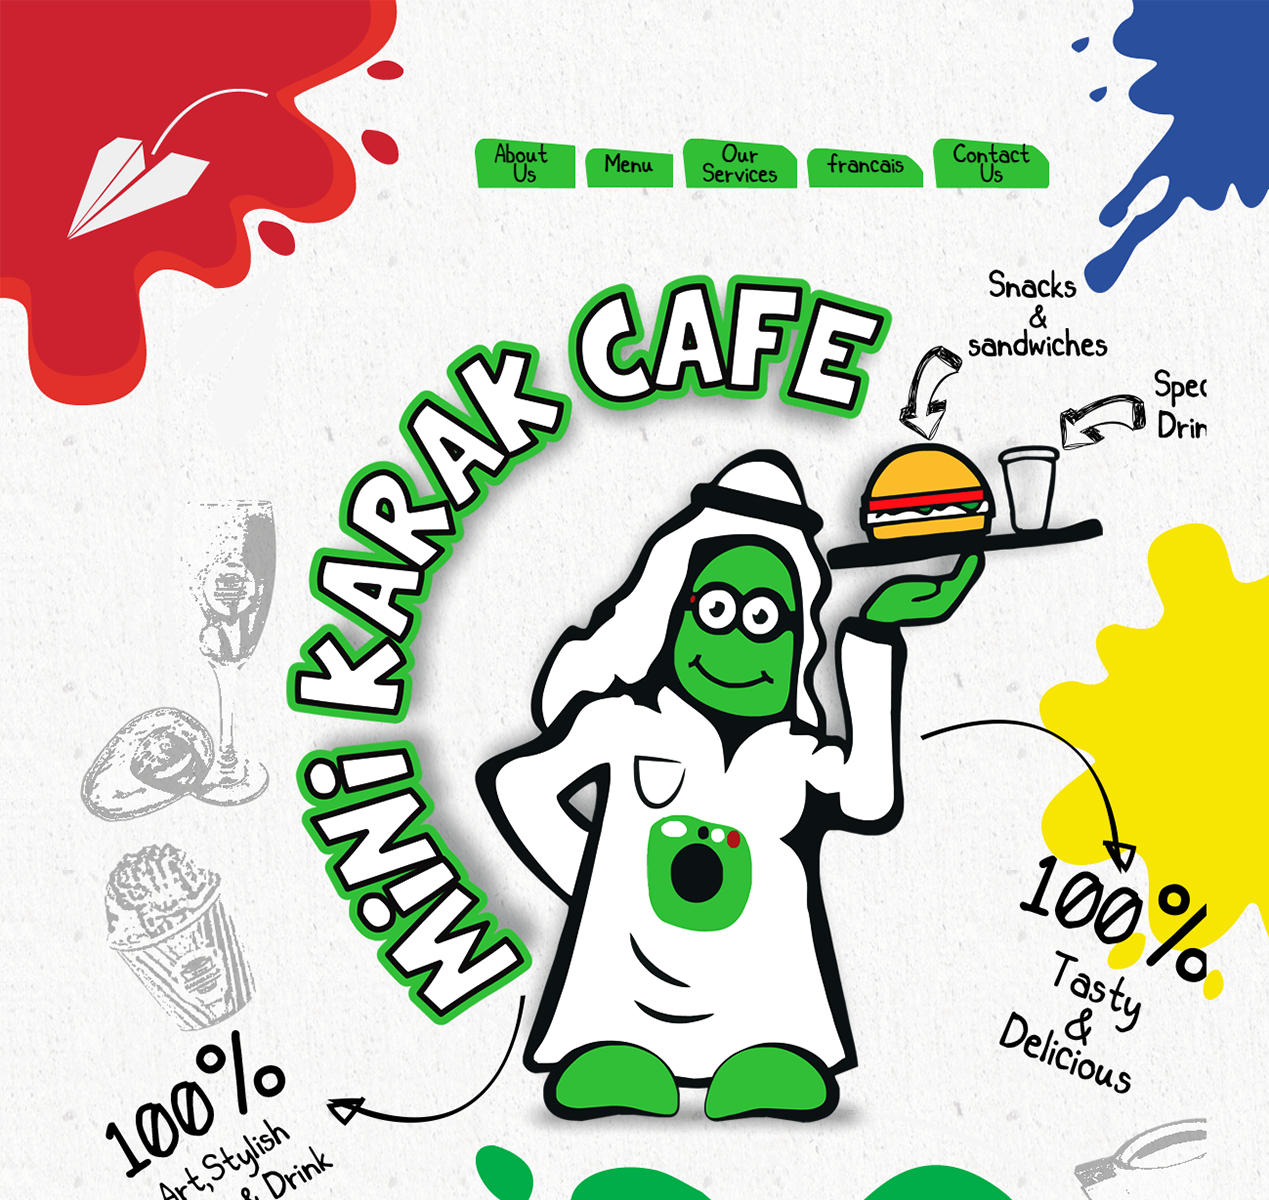 Mini Karak Cafe